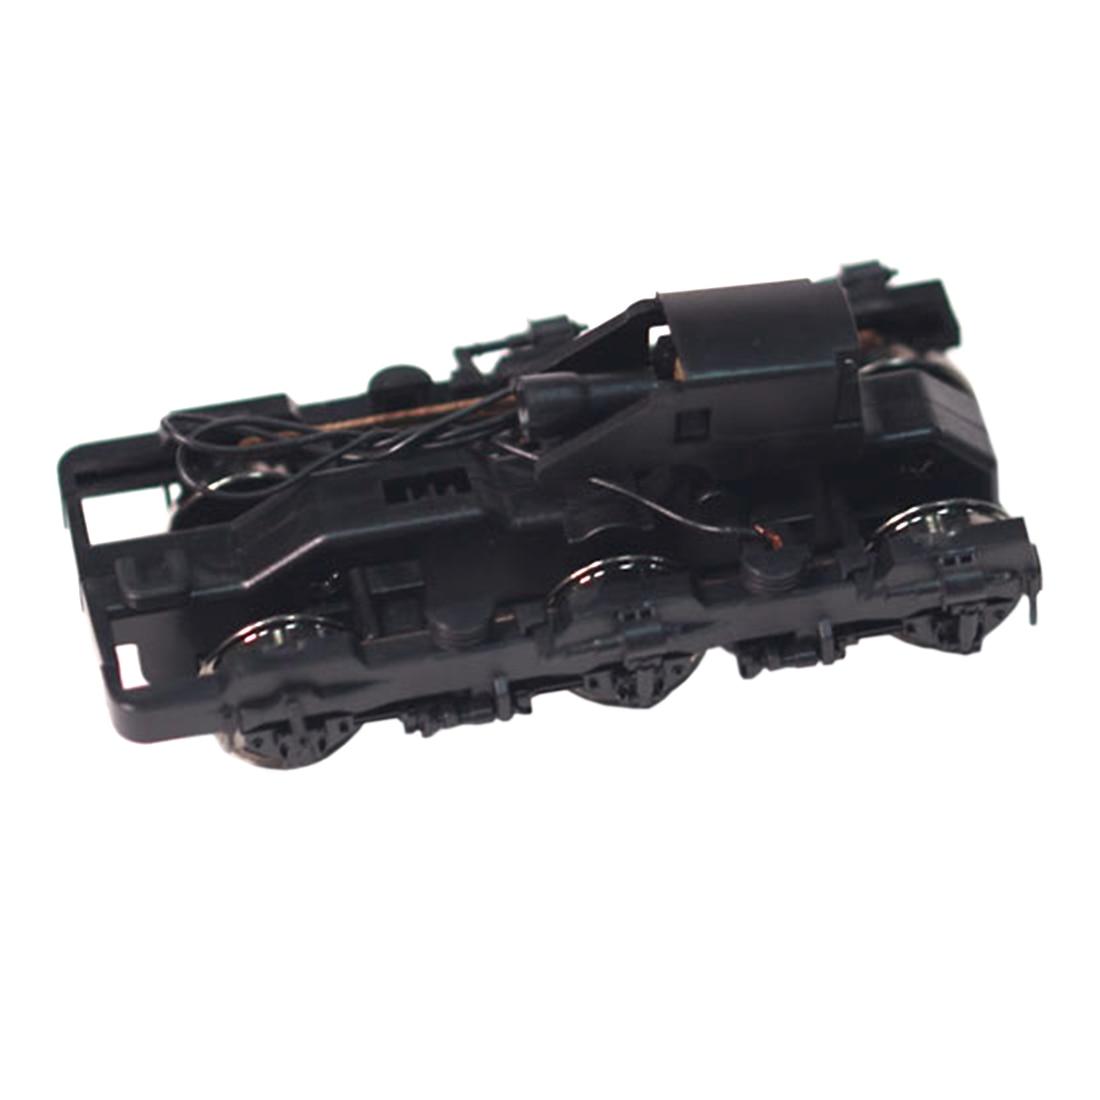 2.8x6.8 سنتيمتر (1.1x2.68 بوصة) 1:87 HO مقياس السكك الحديدية Layou الهيكل السفلي Bogie لمعظم HO مقياس نموذج قطار